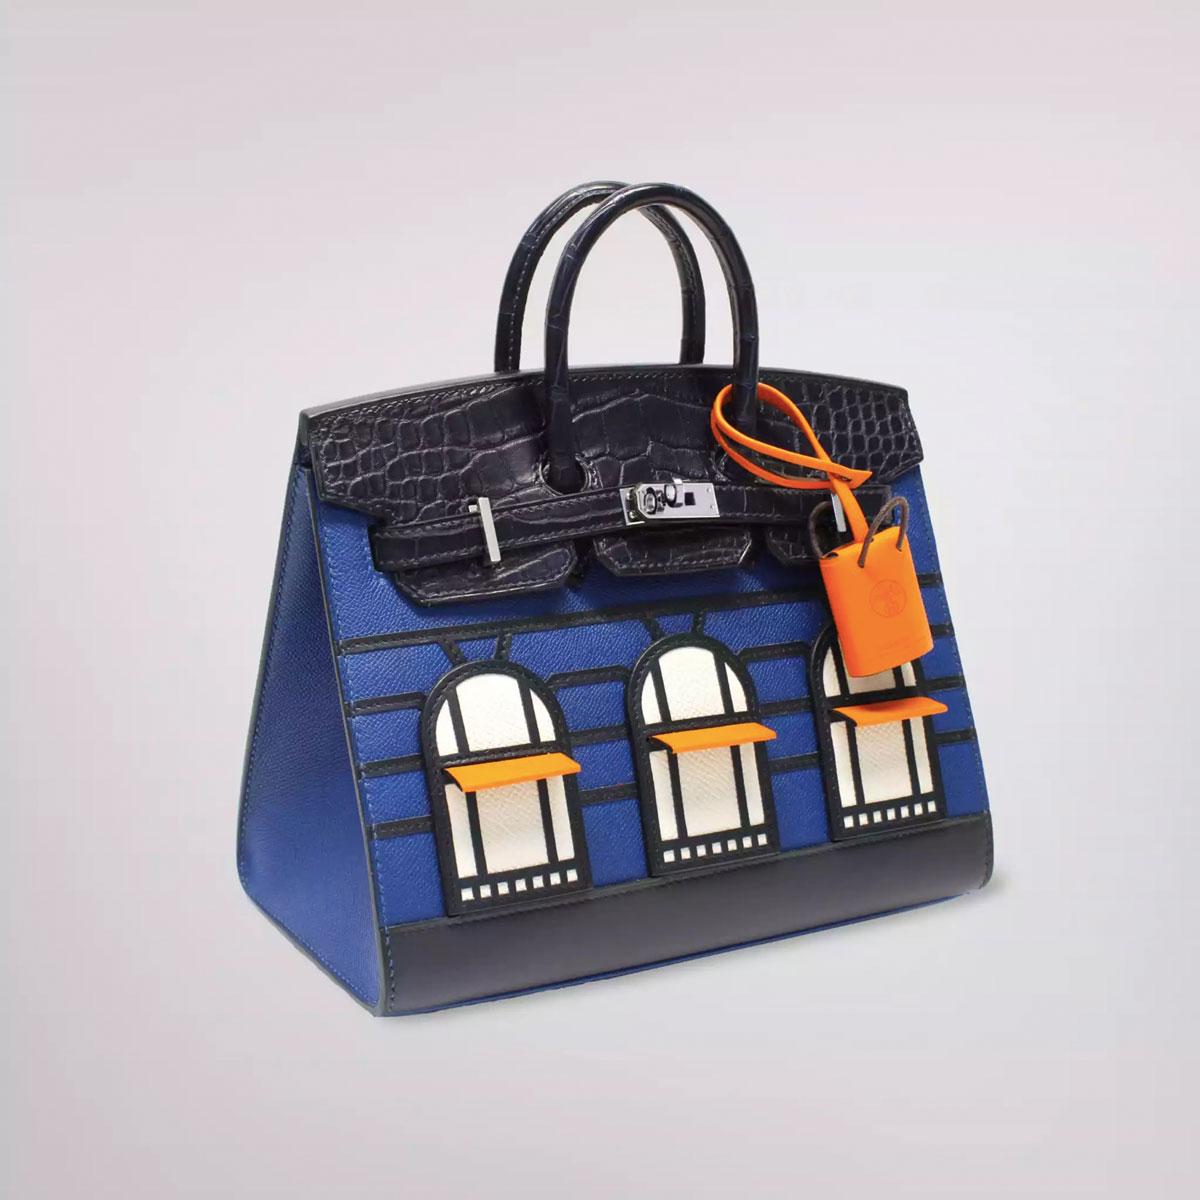 birkin Hermes più costosa al mondo Life&People Magazine LifeandPeople.it